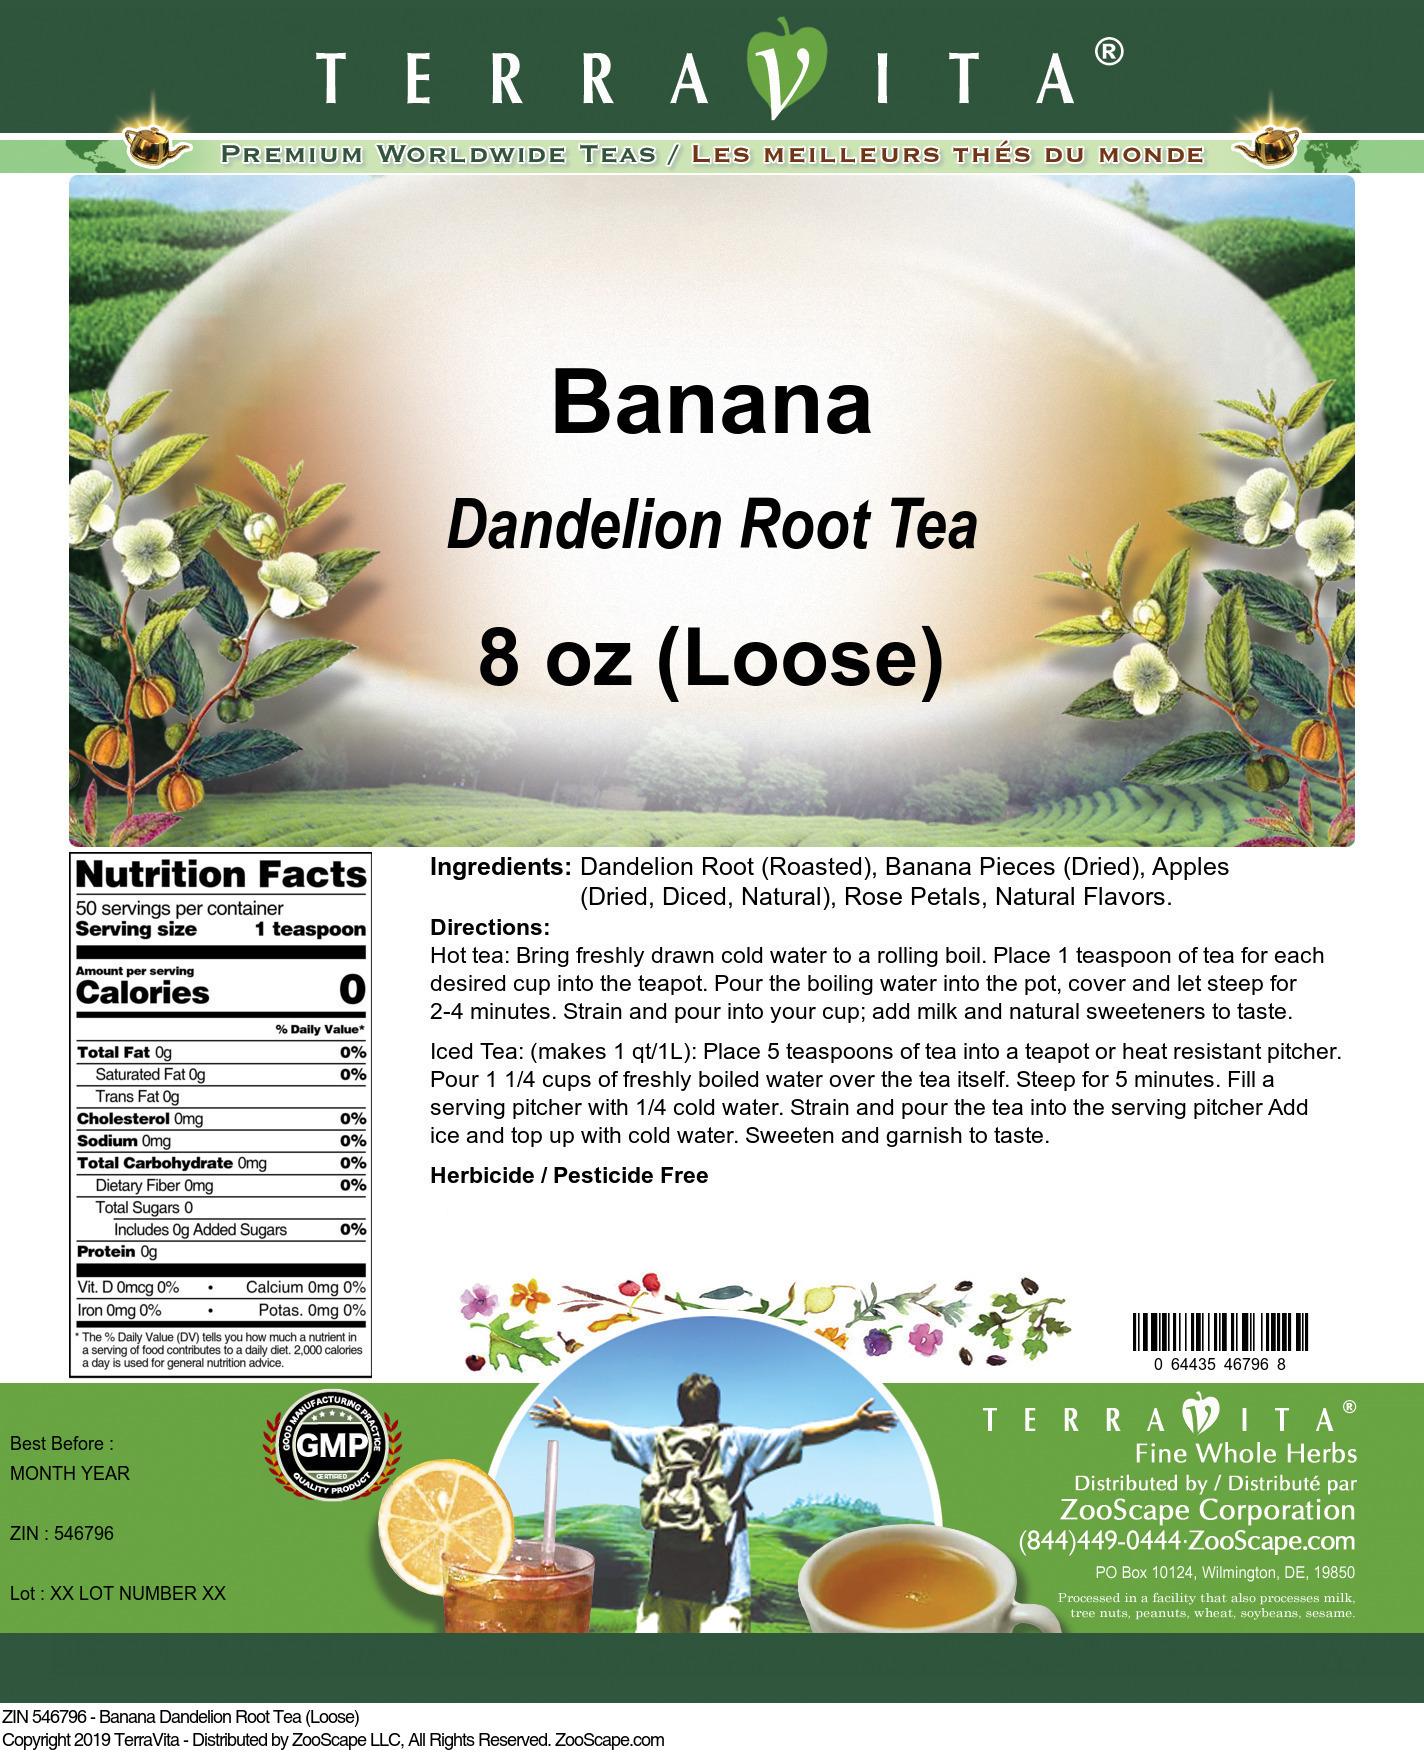 Banana Dandelion Root